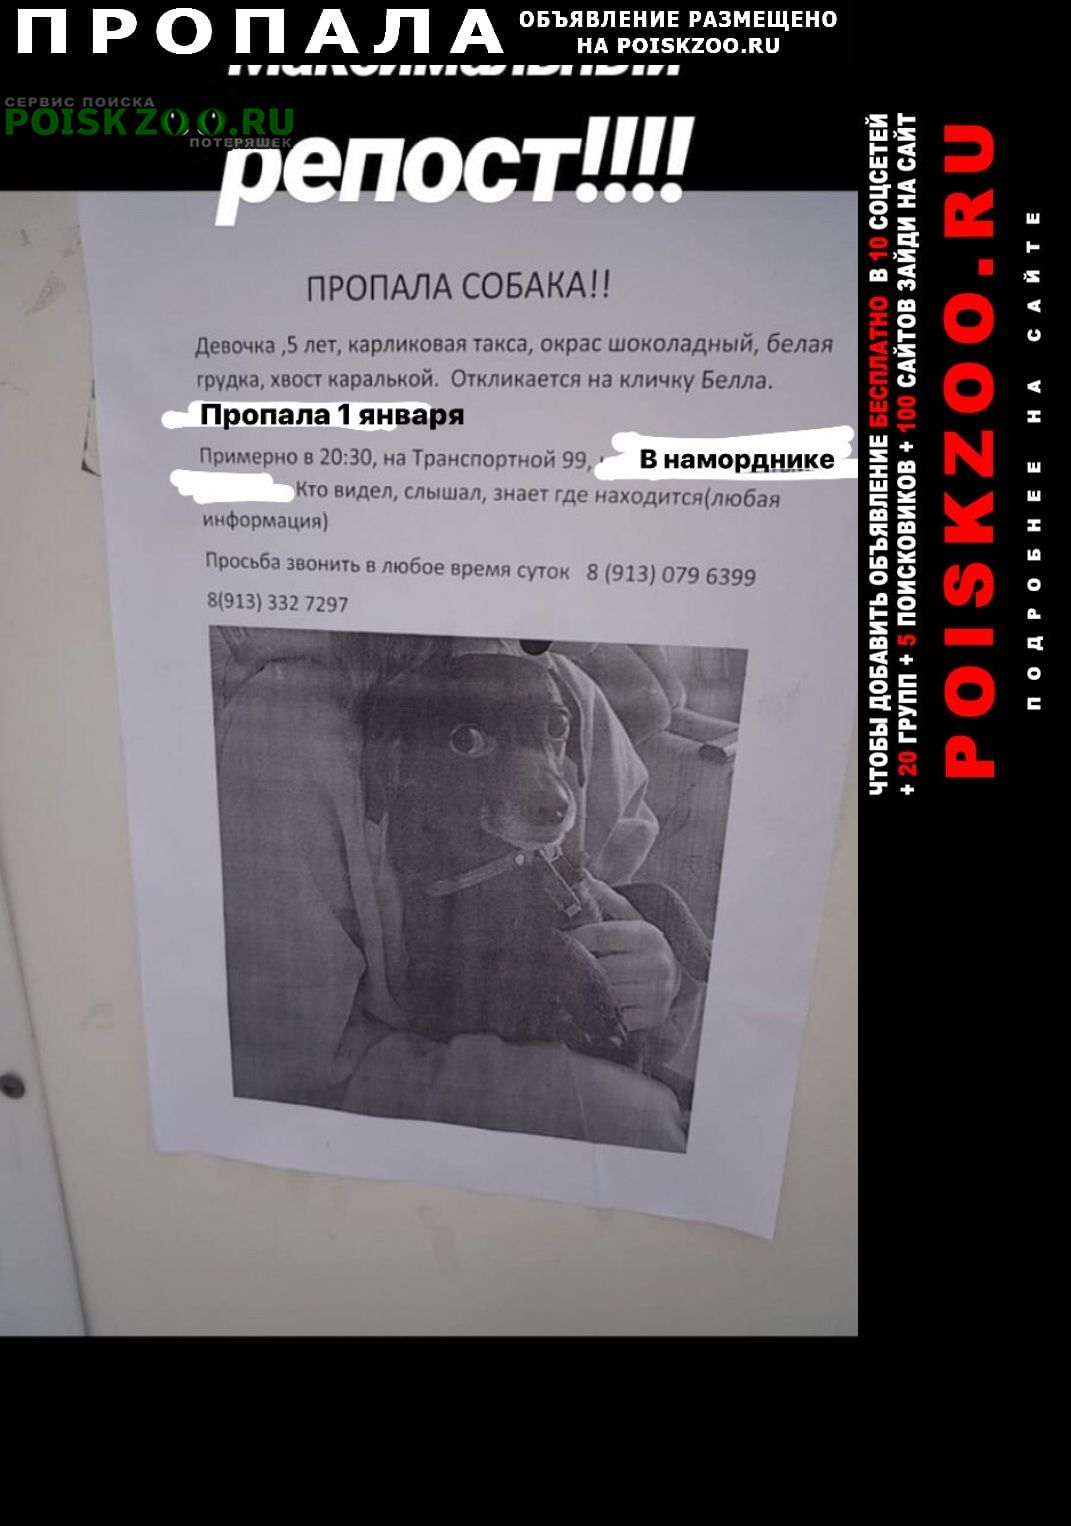 Новокузнецк Пропала собака 1 числа, в наморднике